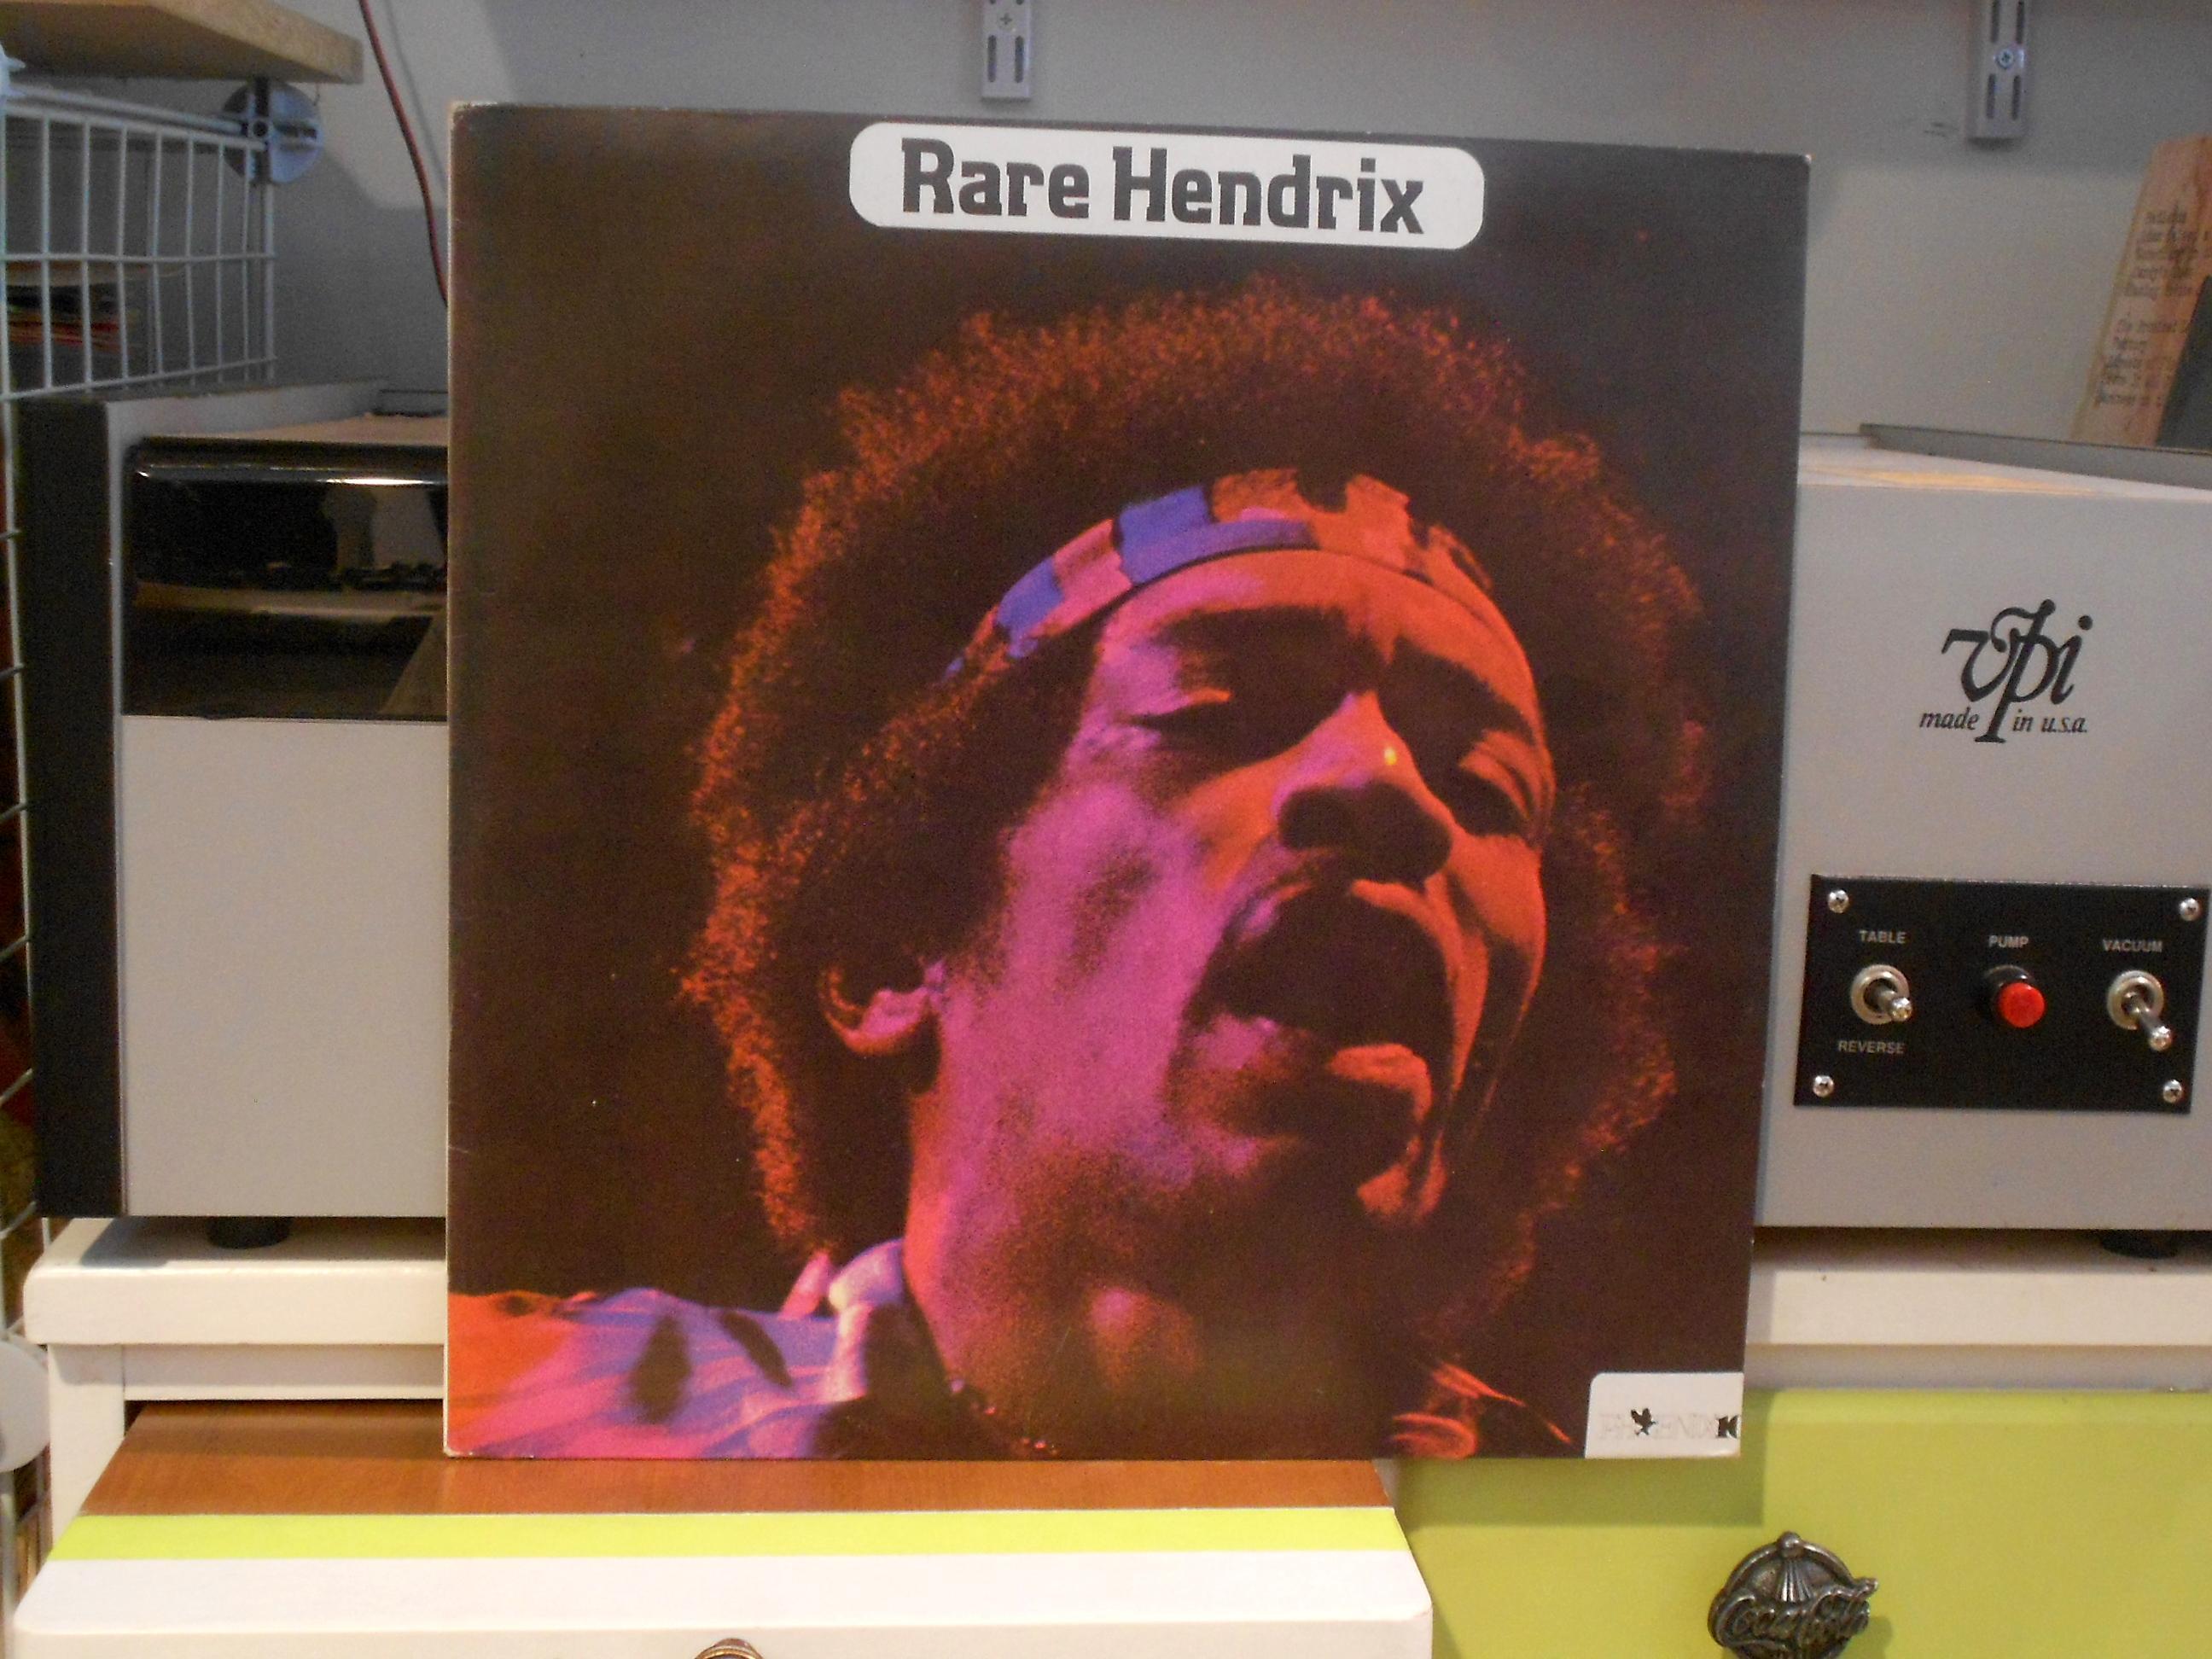 Rare Hendrix Lp - Jimi Hendrix